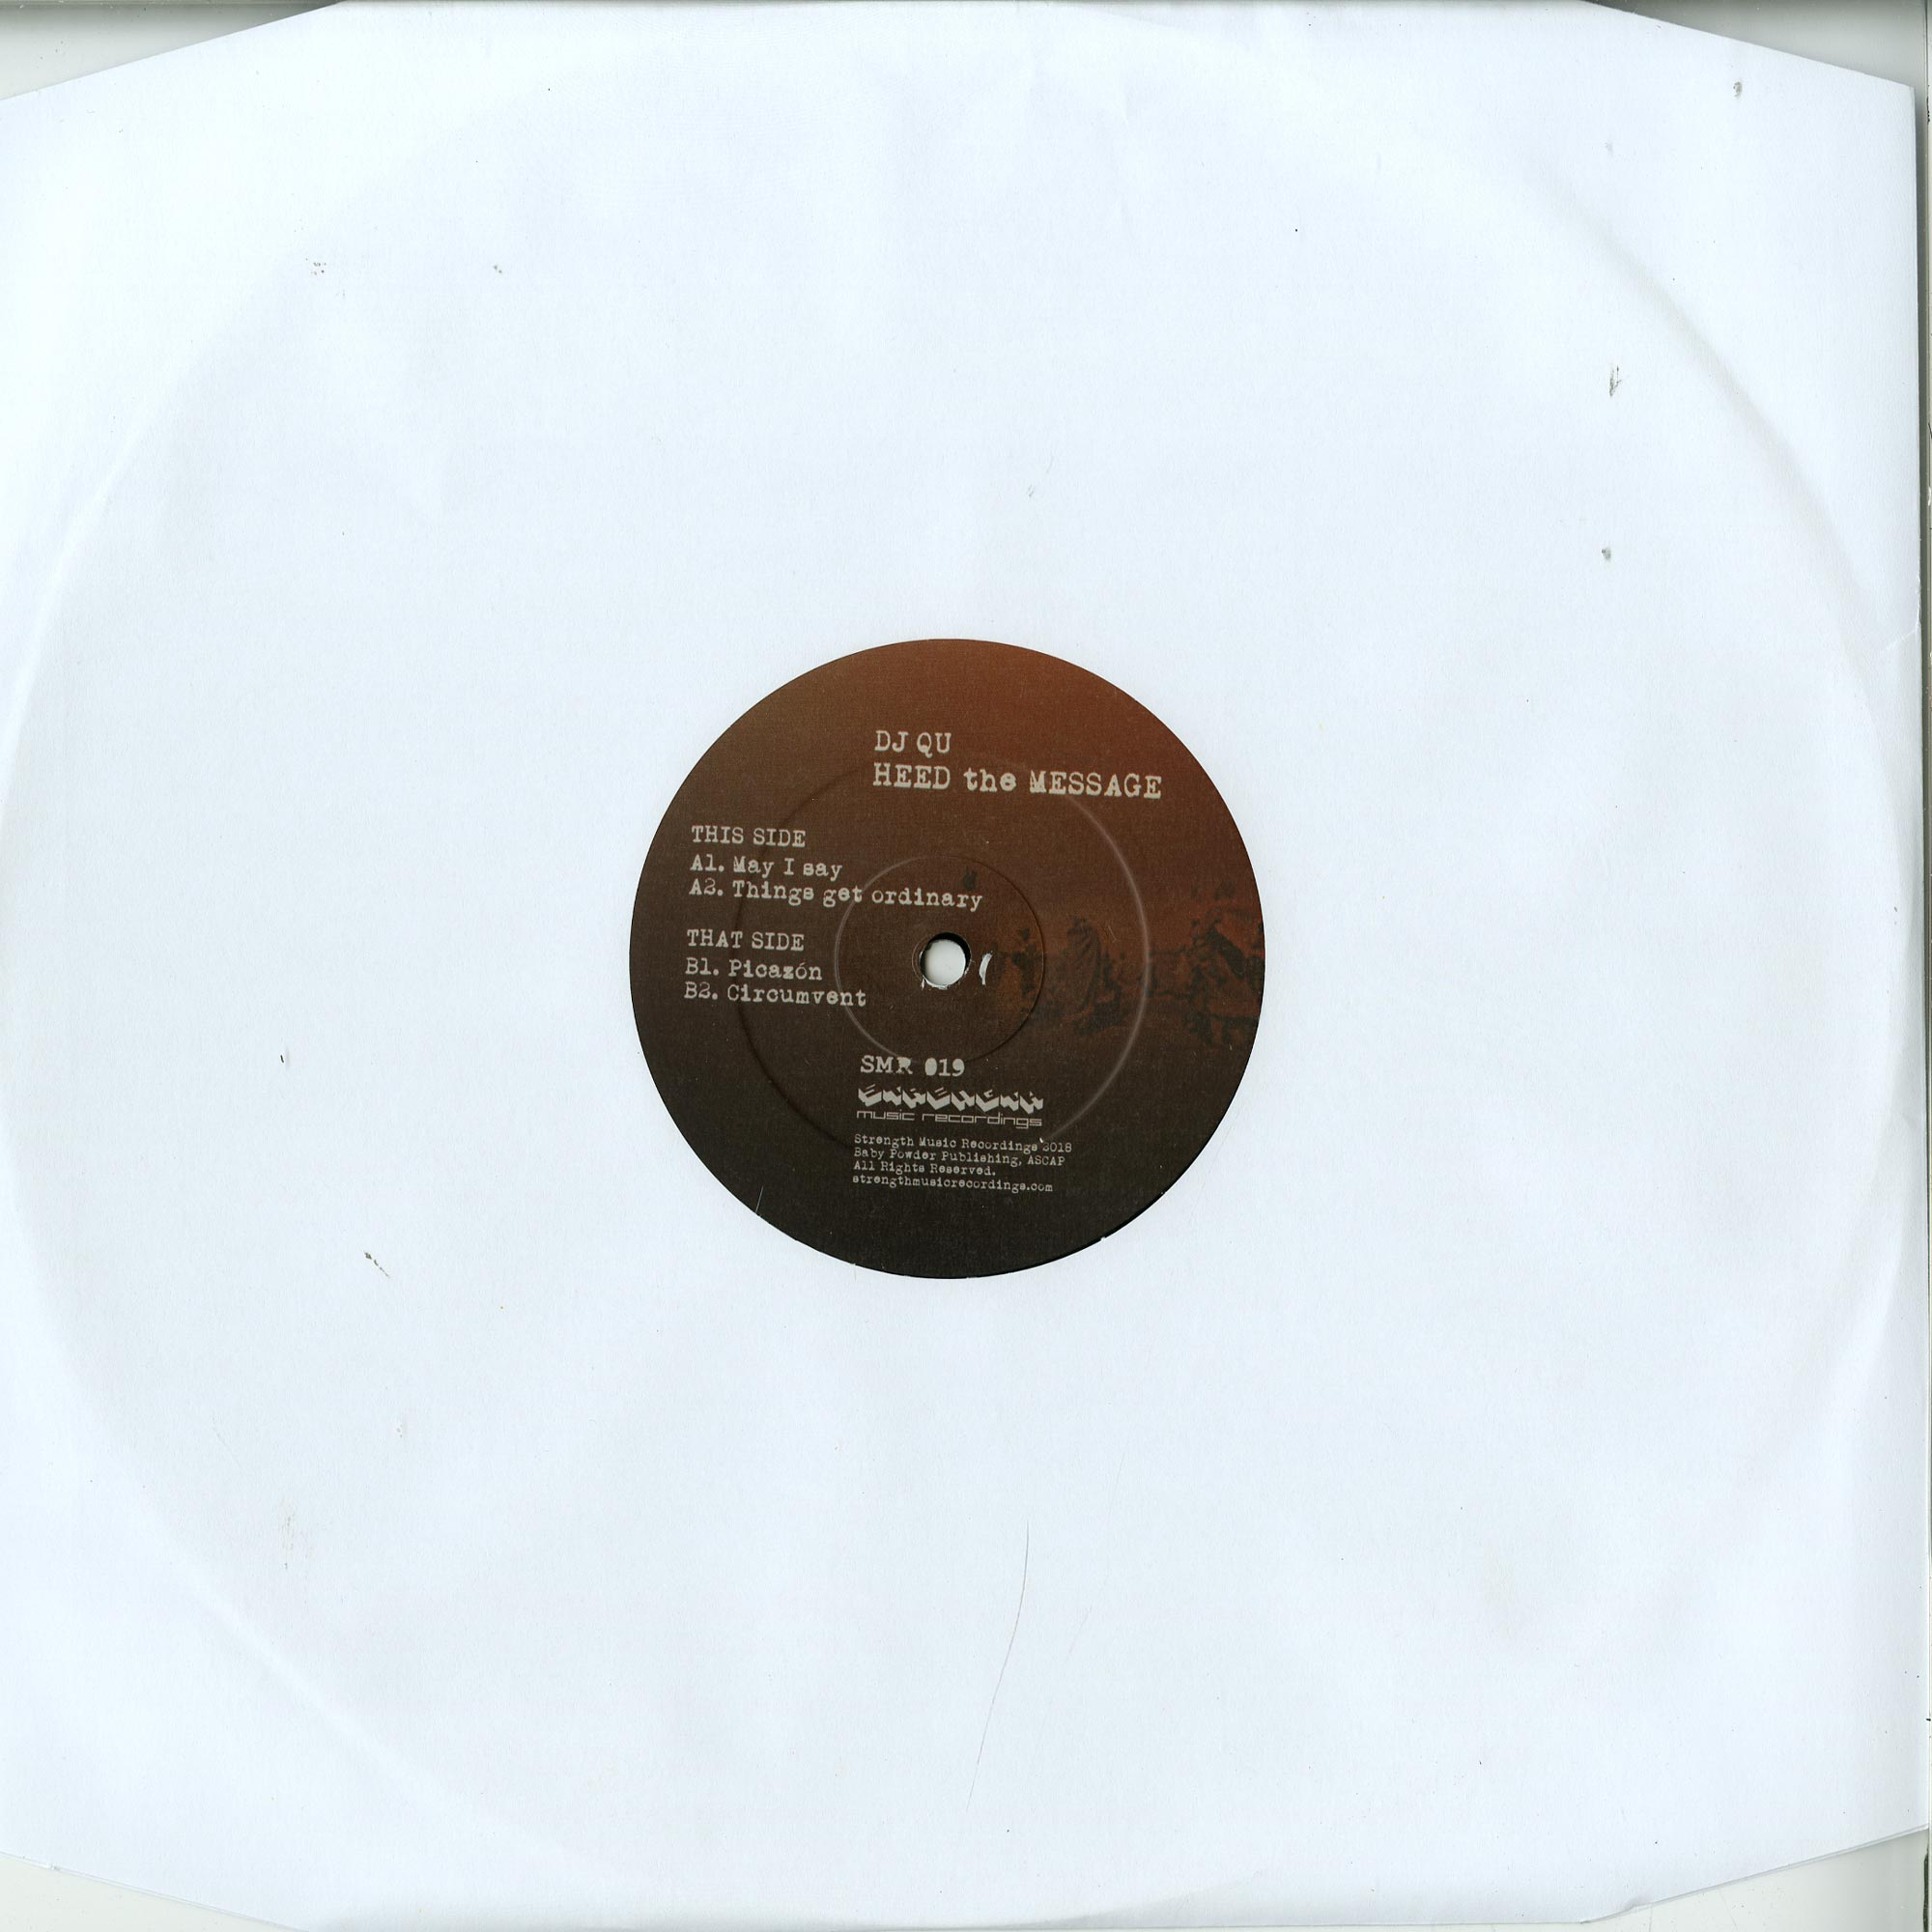 DJ QU - HEED THE MESSAGE